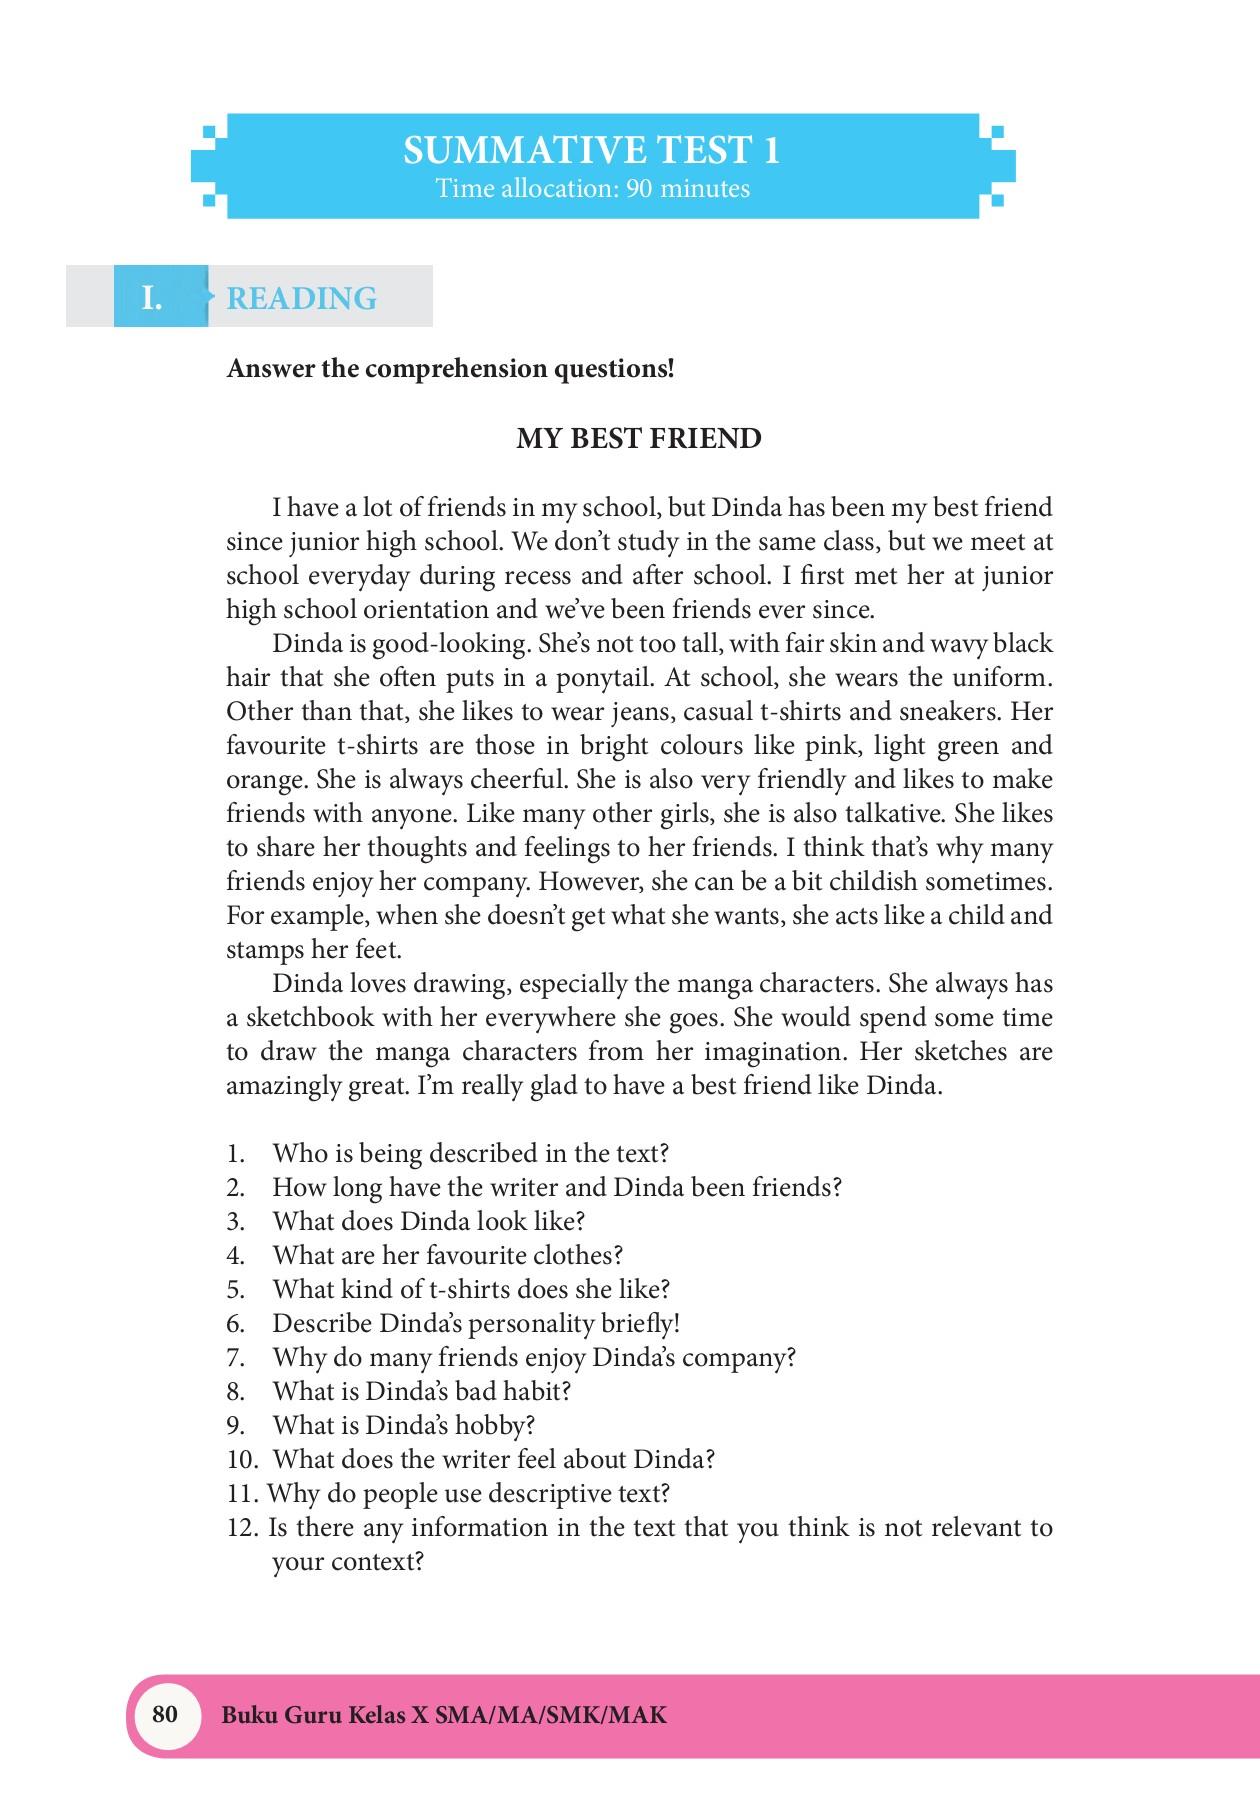 Contoh Descriptive Text Tentang Artis : contoh, descriptive, tentang, artis, Kelas_10_SMA_Bahasa_Inggris_Guru_2017, Pages, Download, FlipHTML5